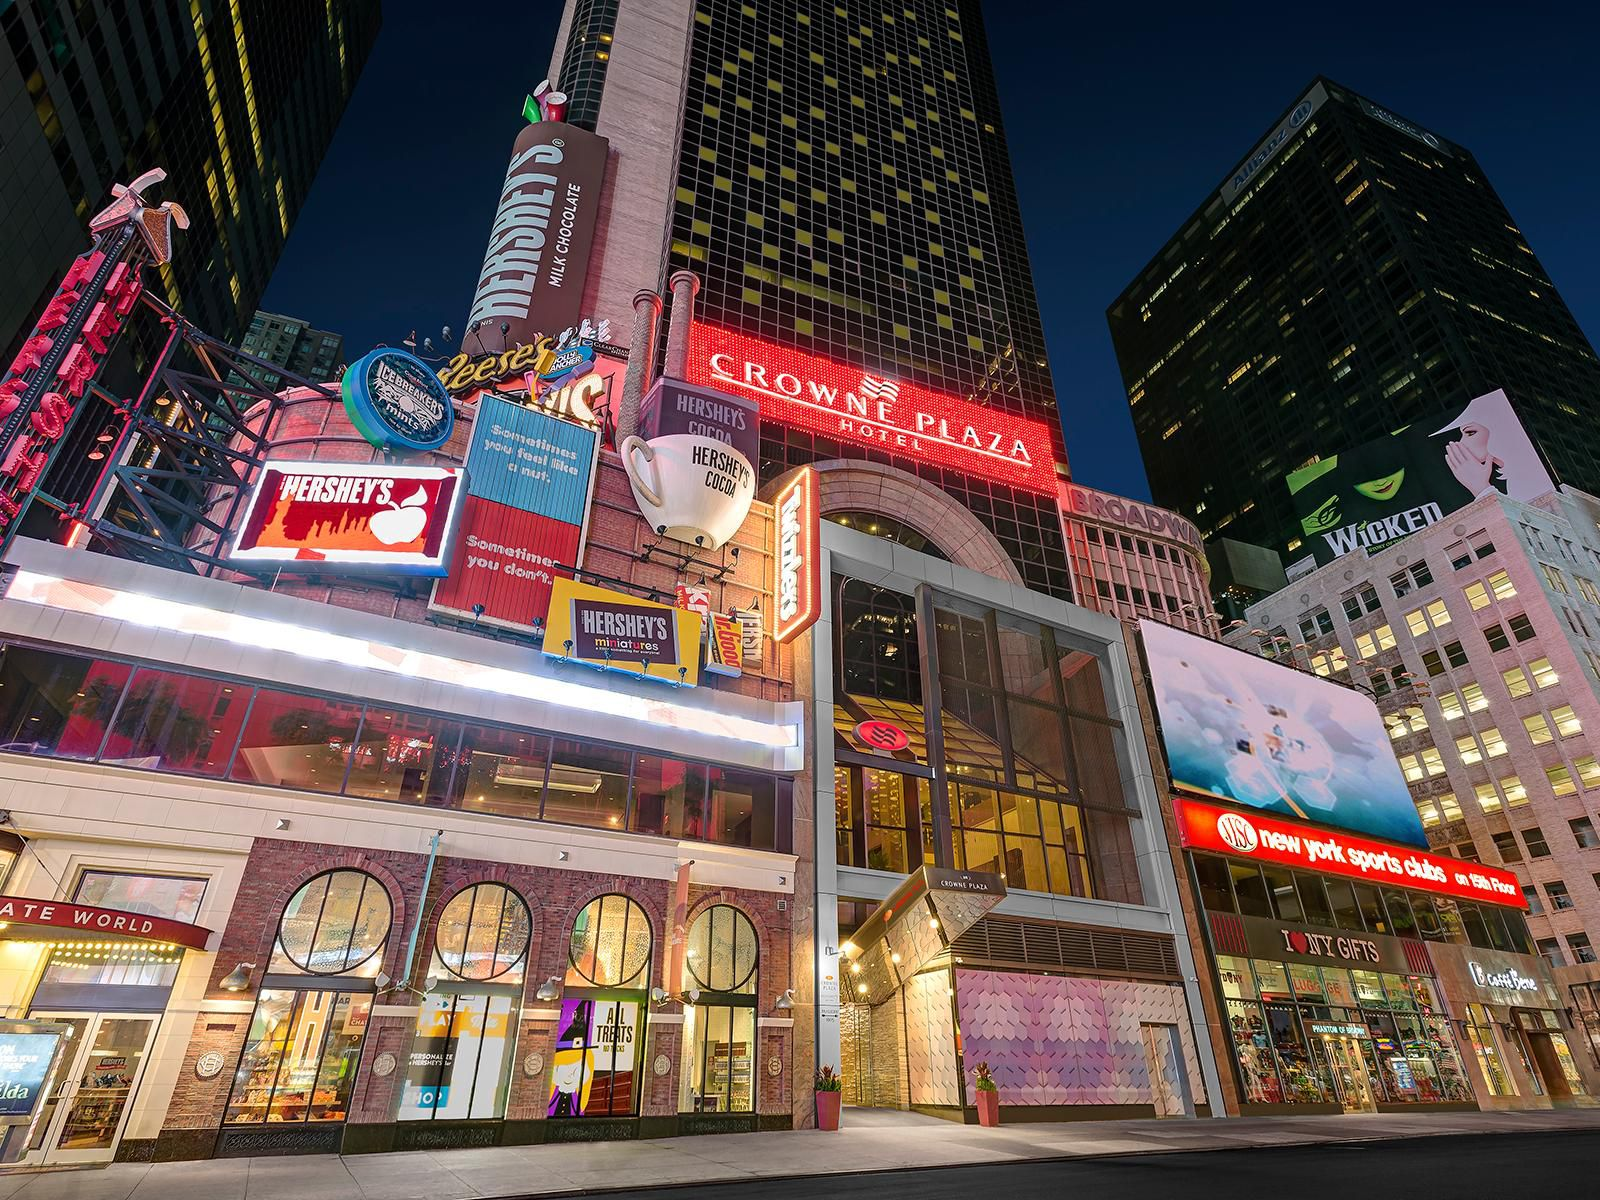 Chelsea plaza hotel dubai dubai book cheap amp discount hotels - Hotels In New York City Find The Best Budget City Centre Rooms In New York City Ny Ihg